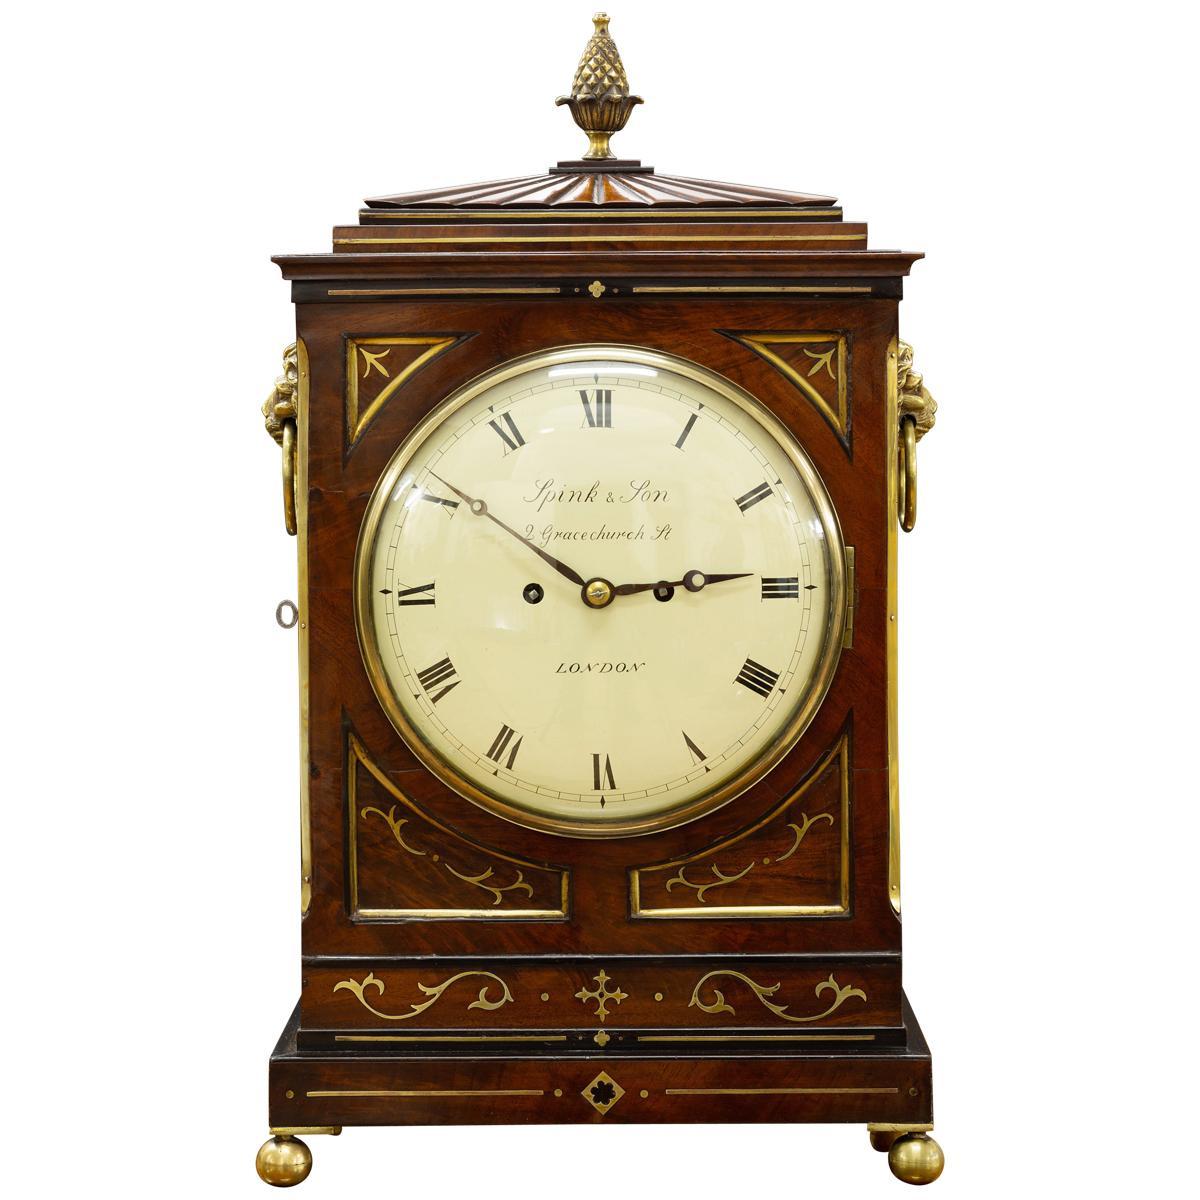 Regency Mahogany Bracket Clock by Spink & Son, London